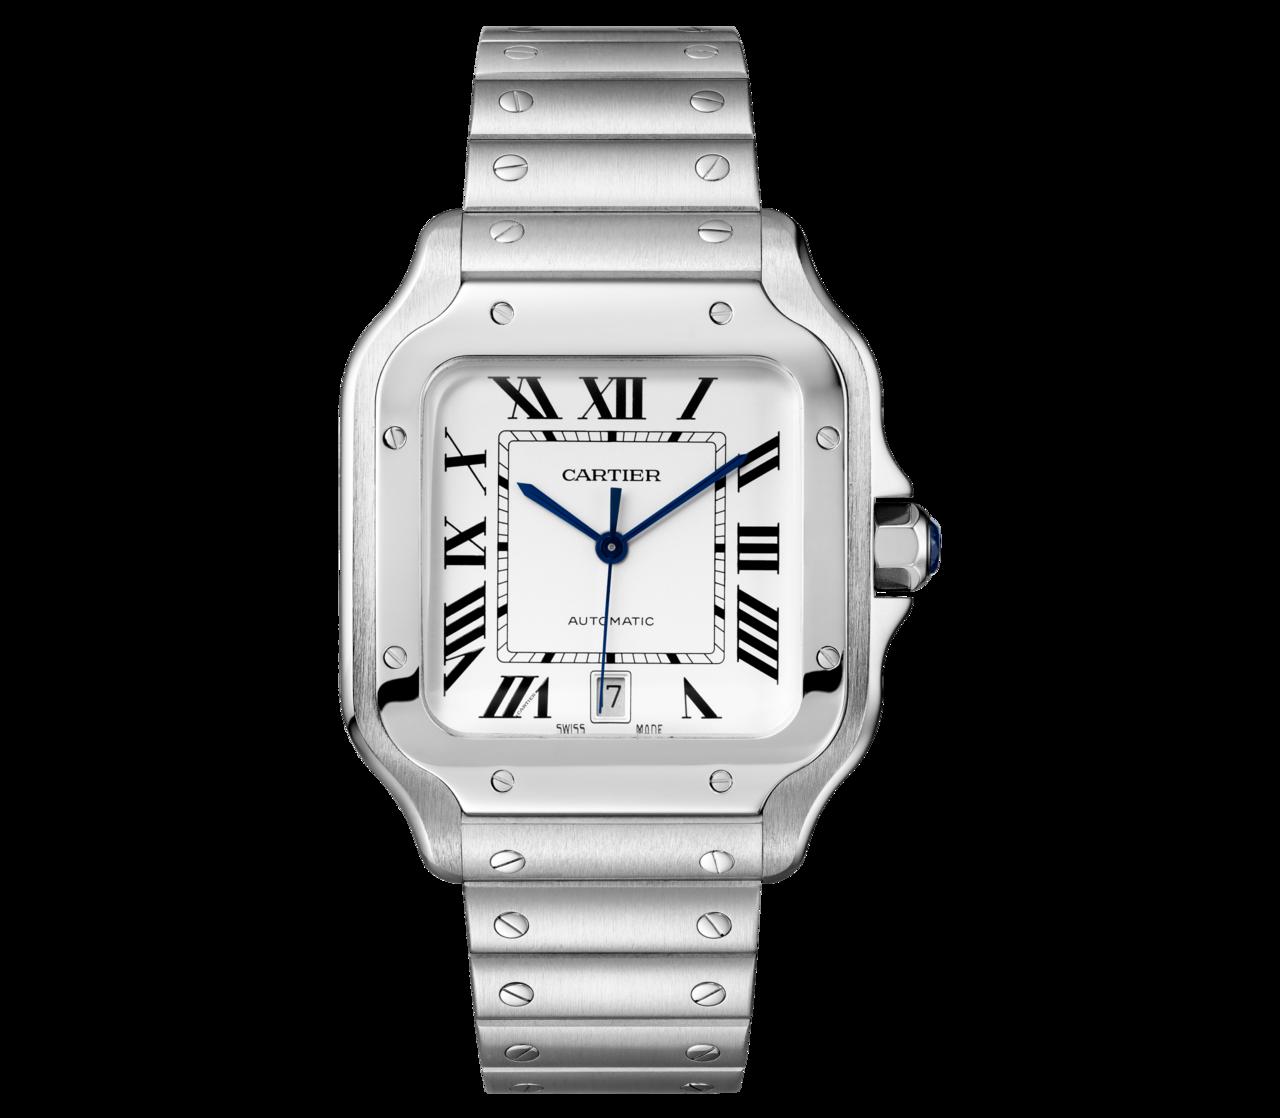 Santos de Cartier 精鋼大型款腕表,QuickSwitch 可更...